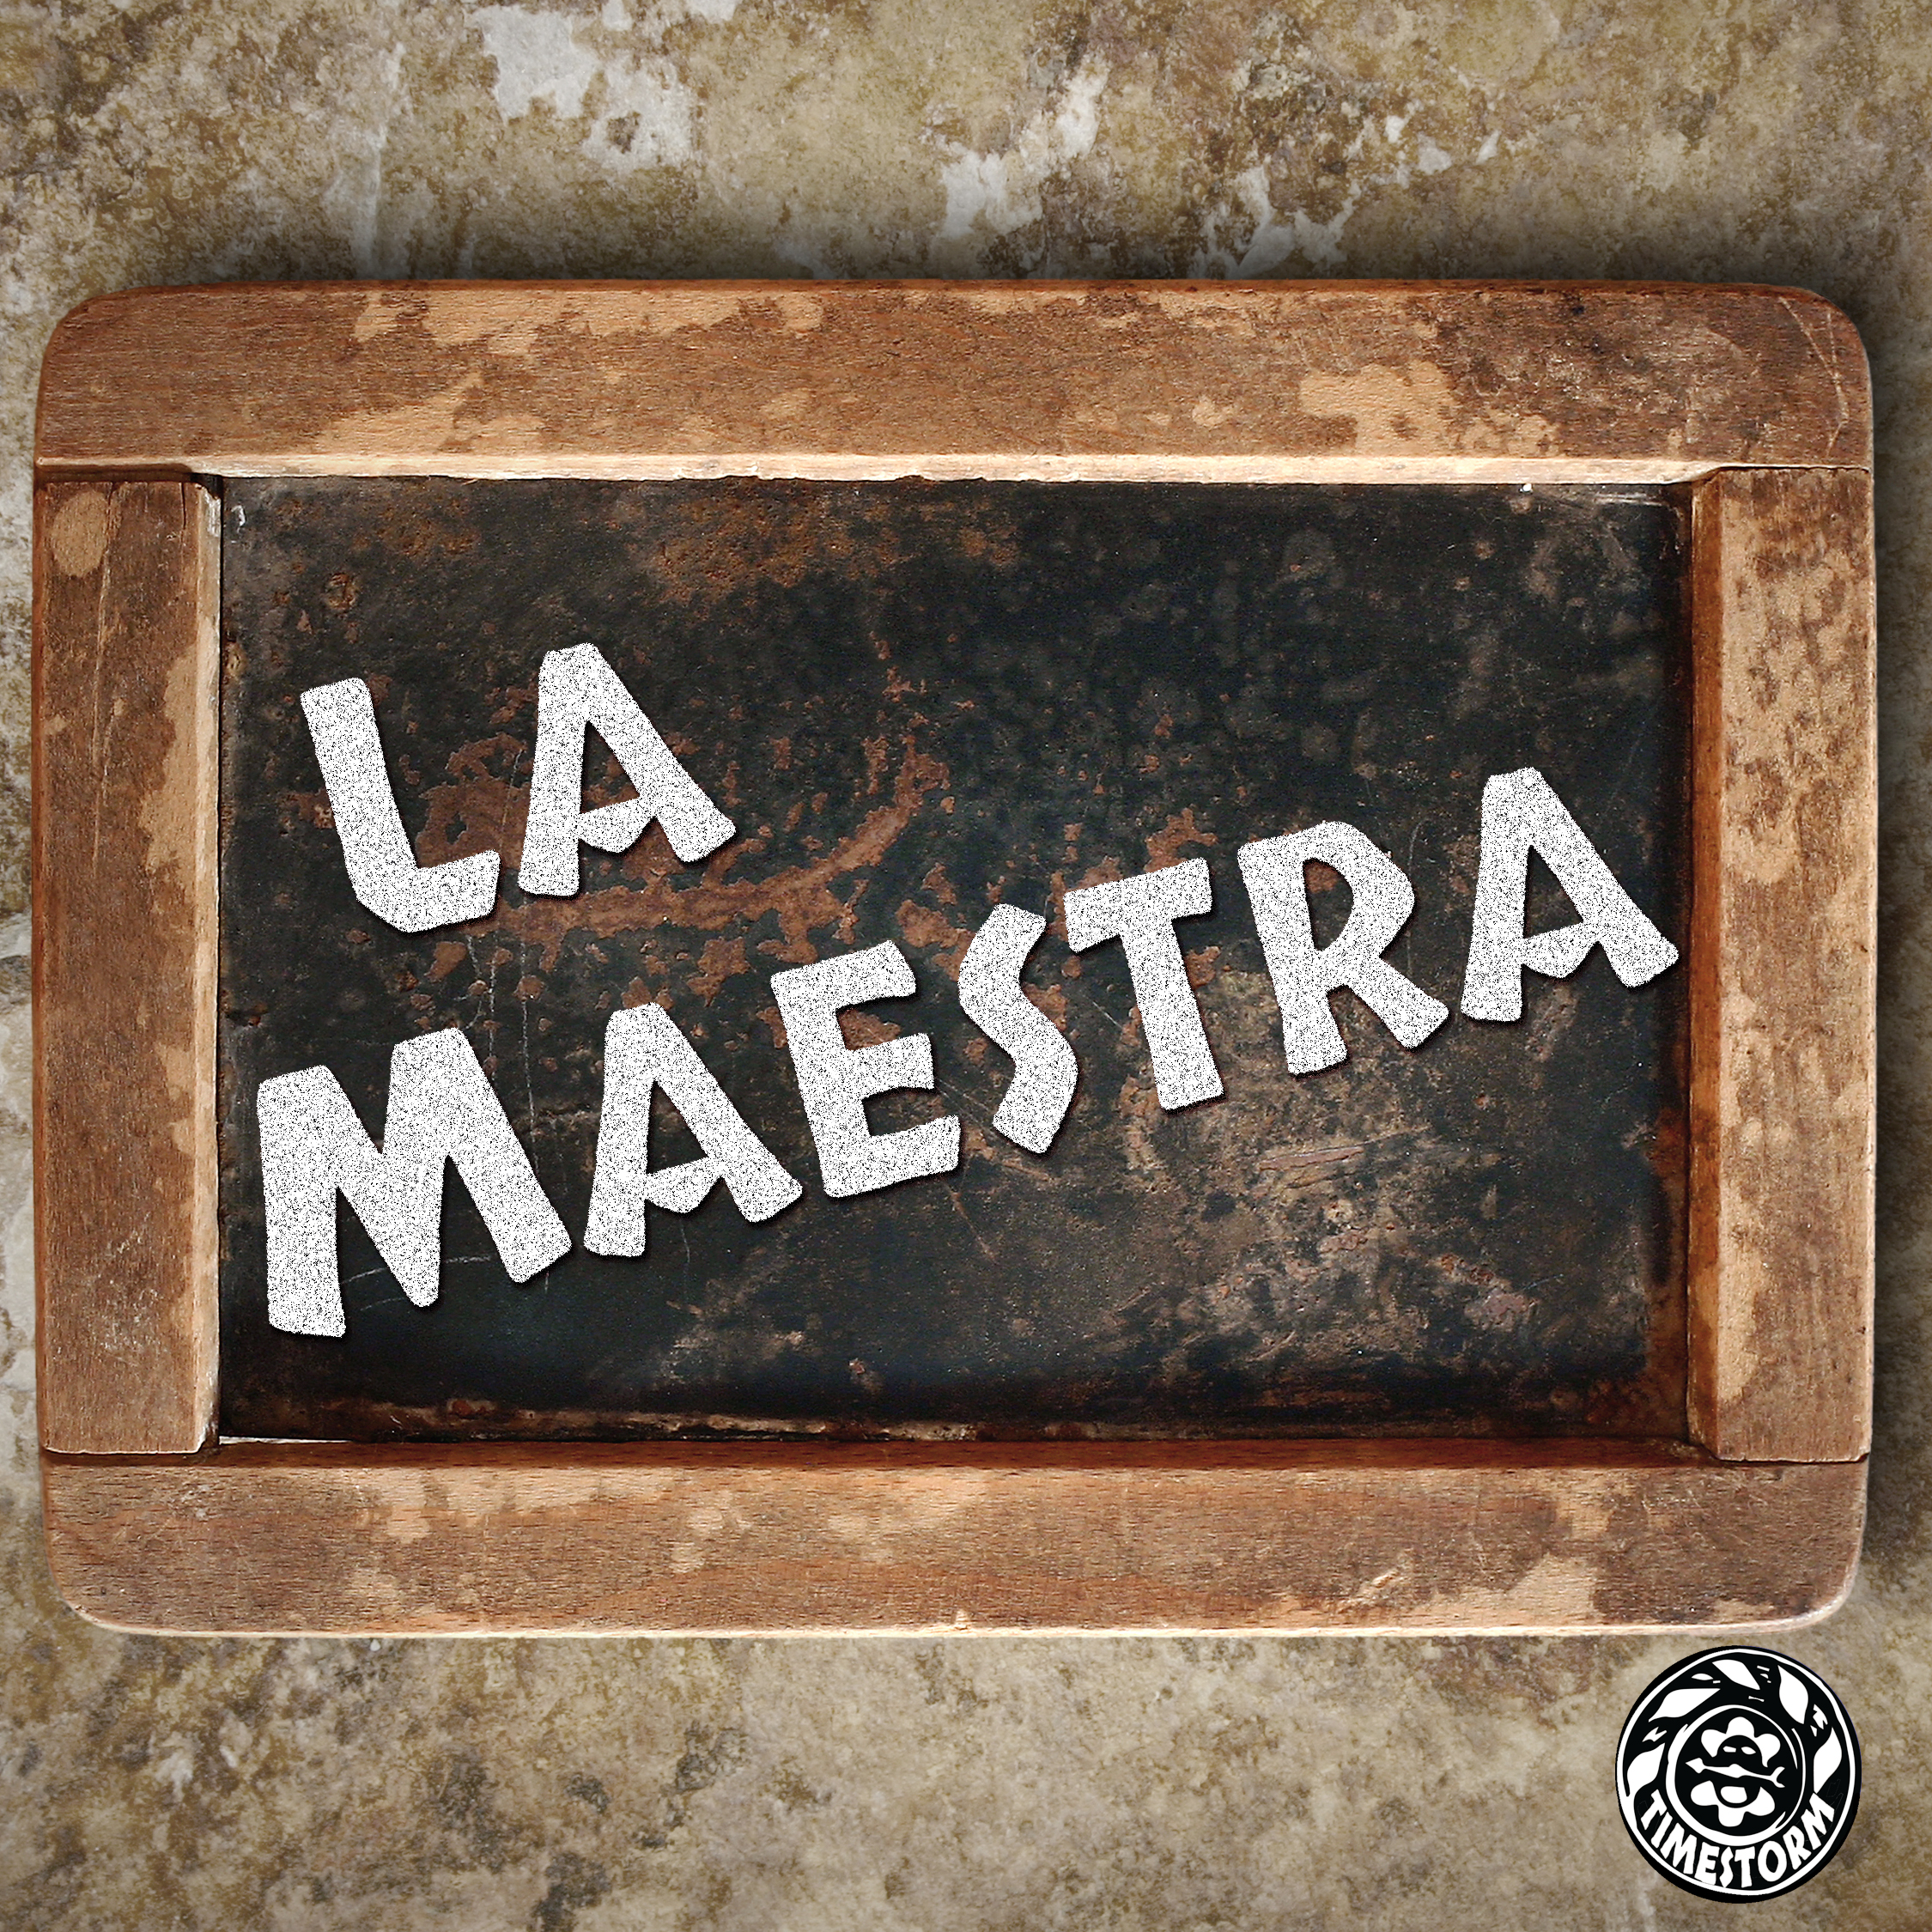 Episode 4: La Maestra